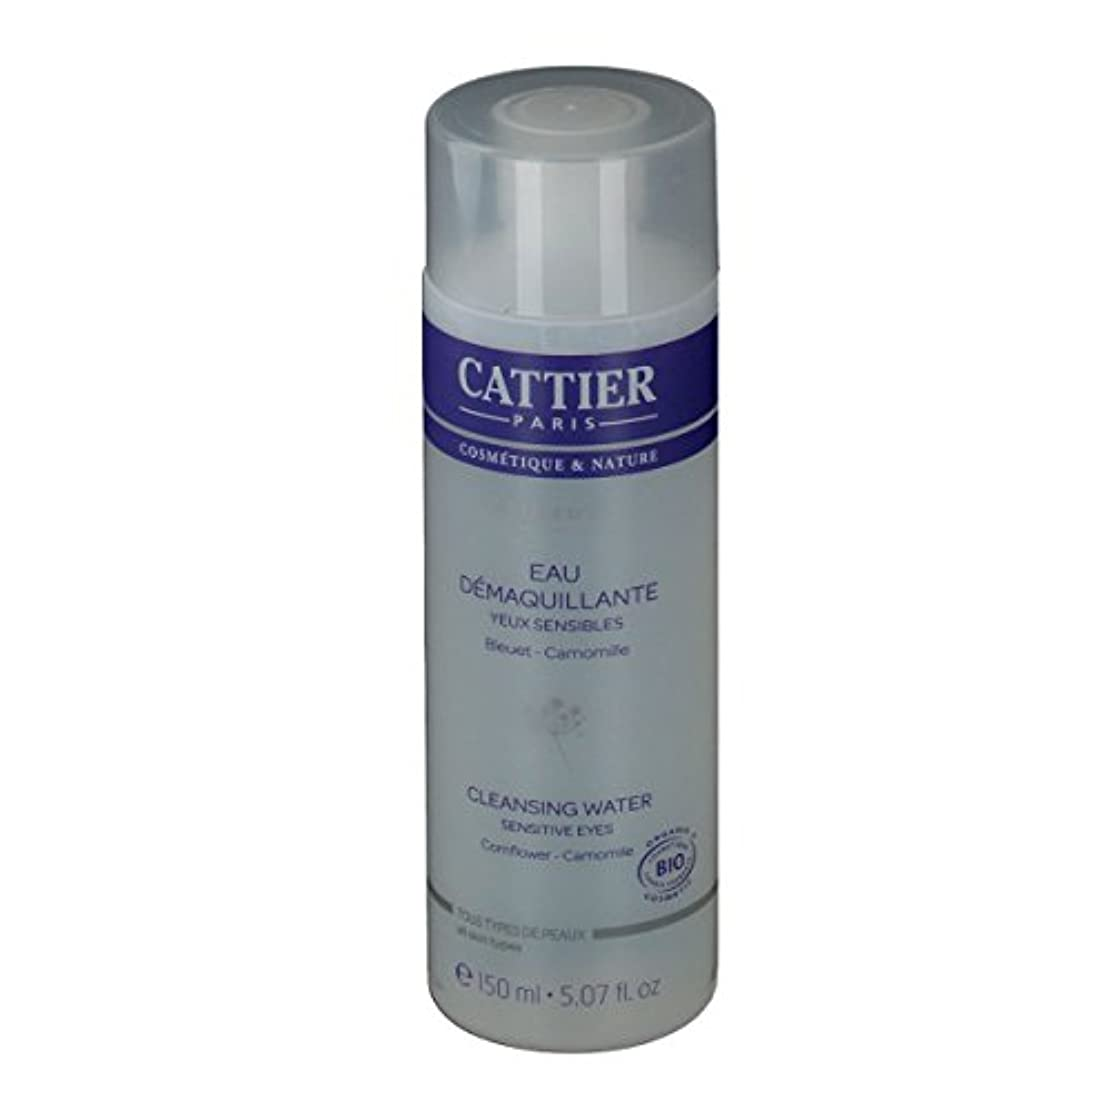 四回概要外科医Cattier Cleansing Water Eyes 150ml [並行輸入品]